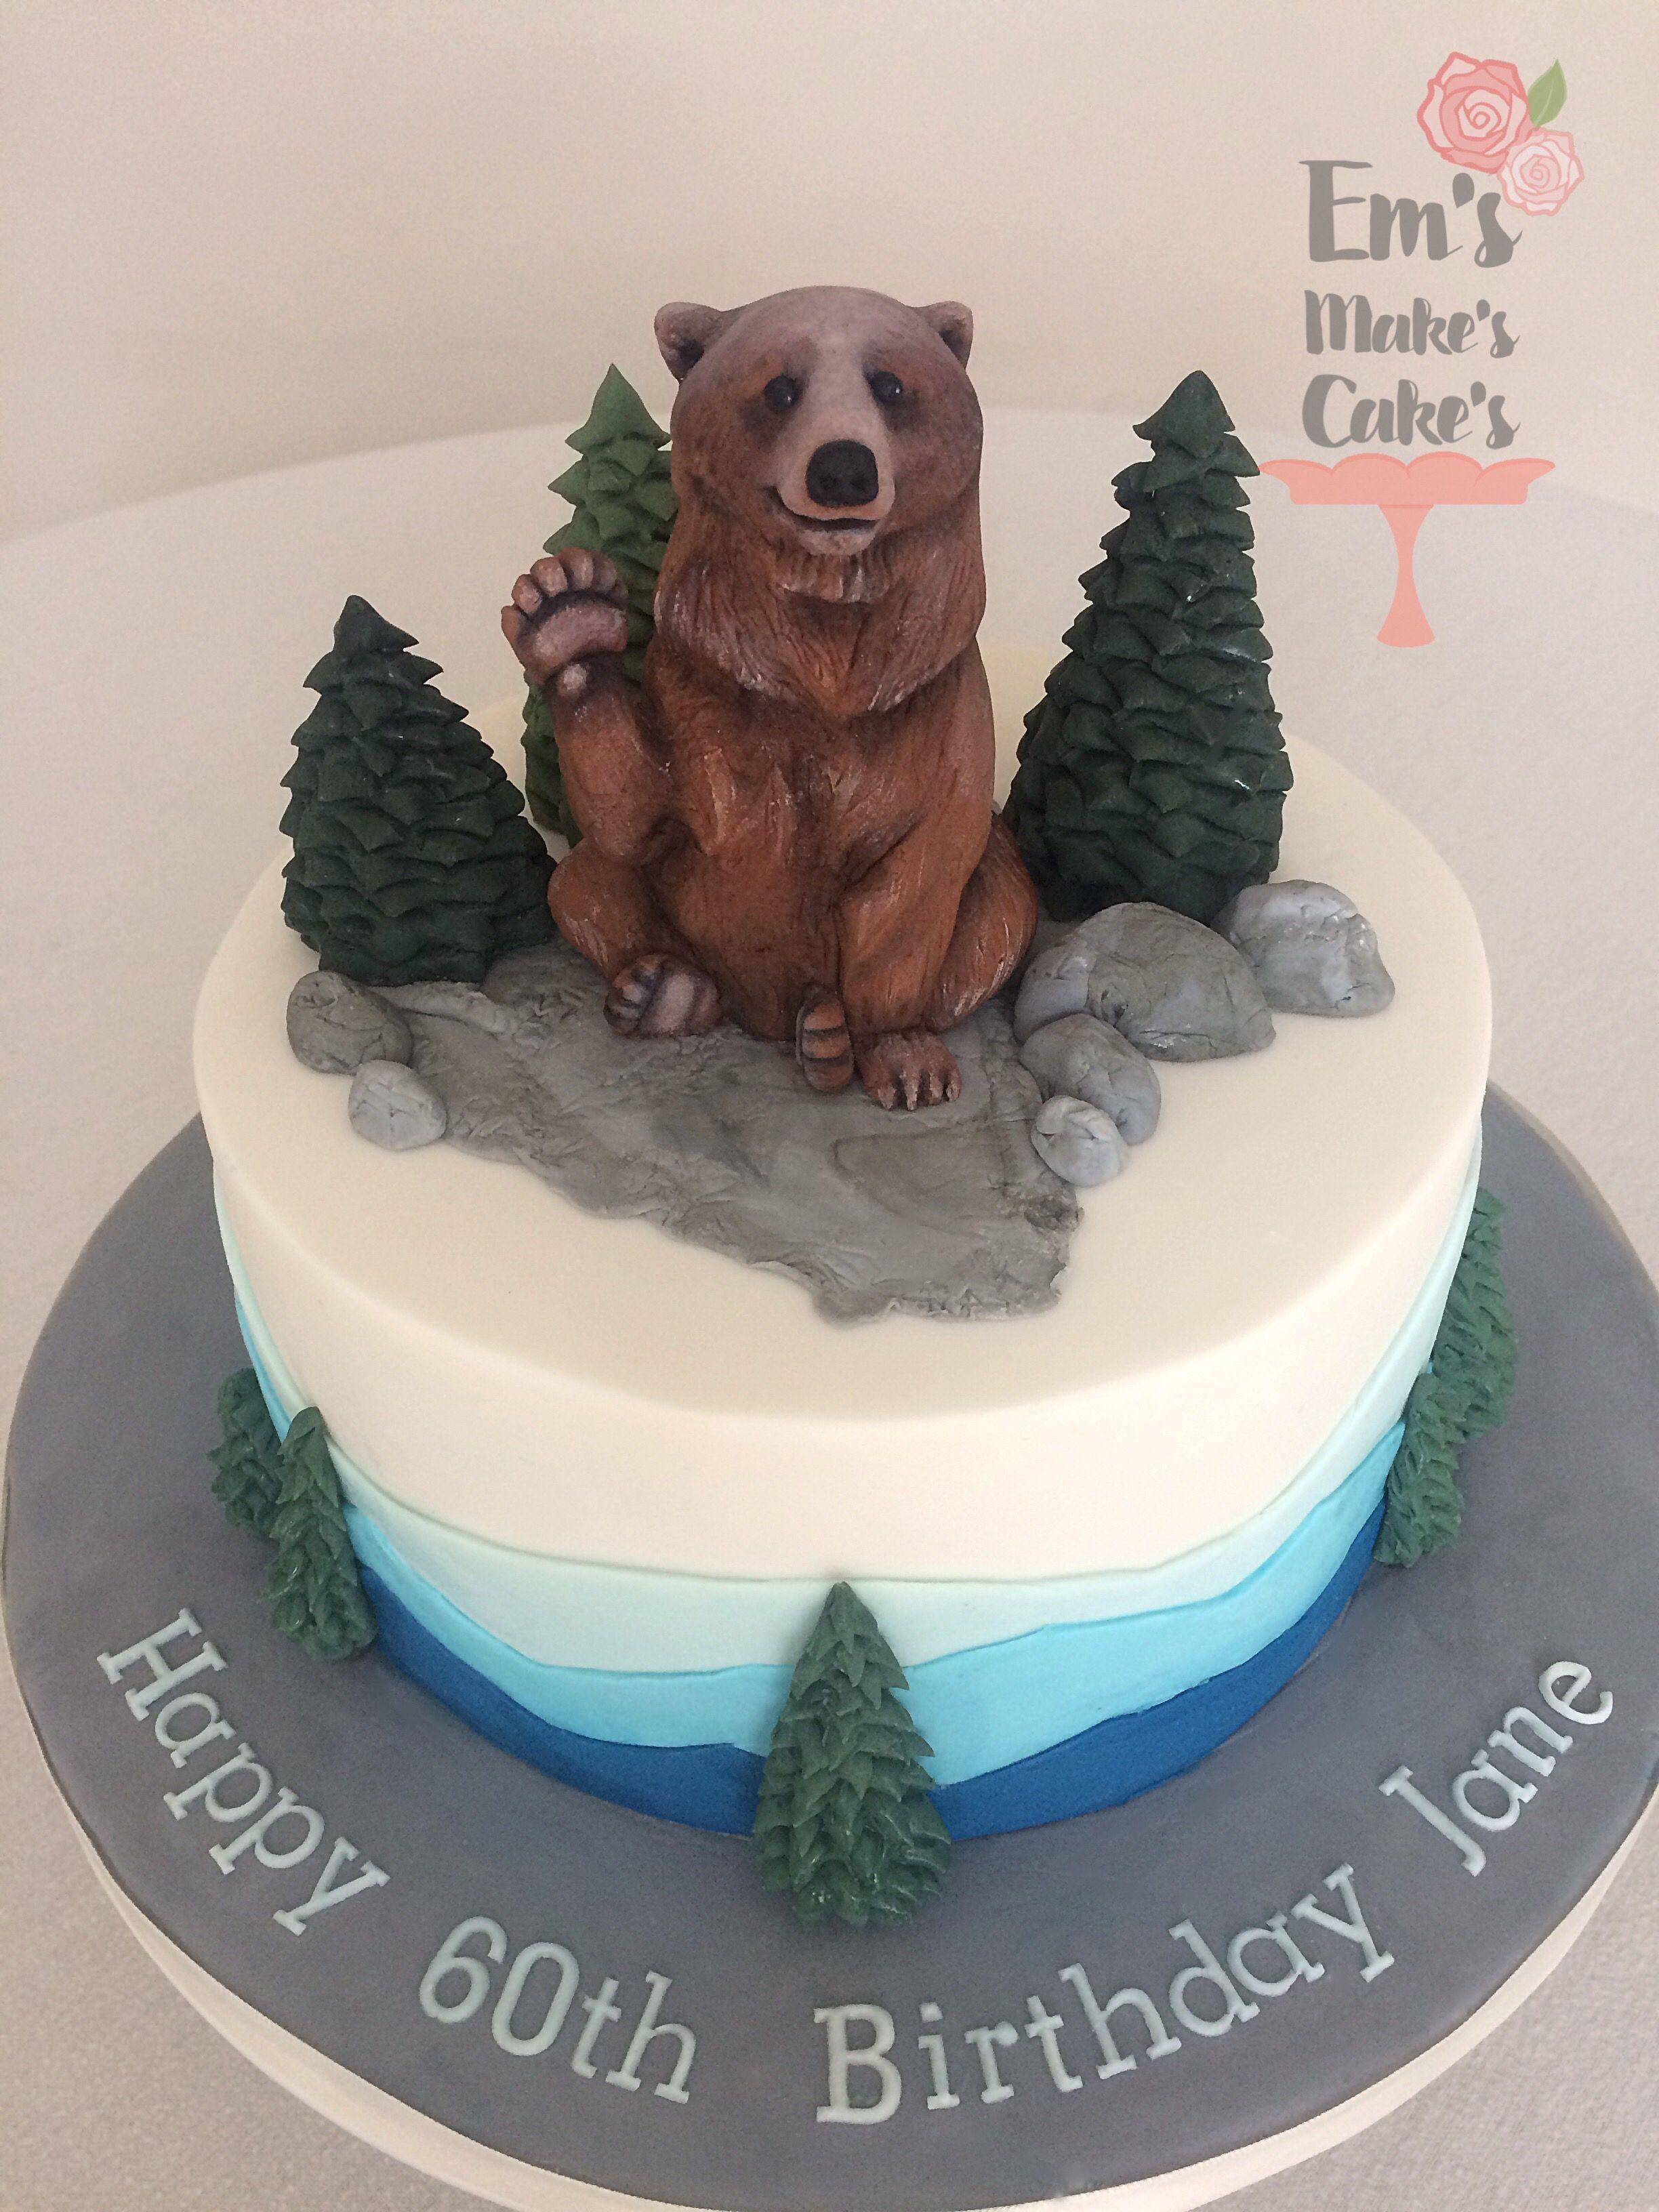 Astounding Mountain Range Grizzly Bear Theme Cake 10 Birthday Cake Cake Funny Birthday Cards Online Aeocydamsfinfo